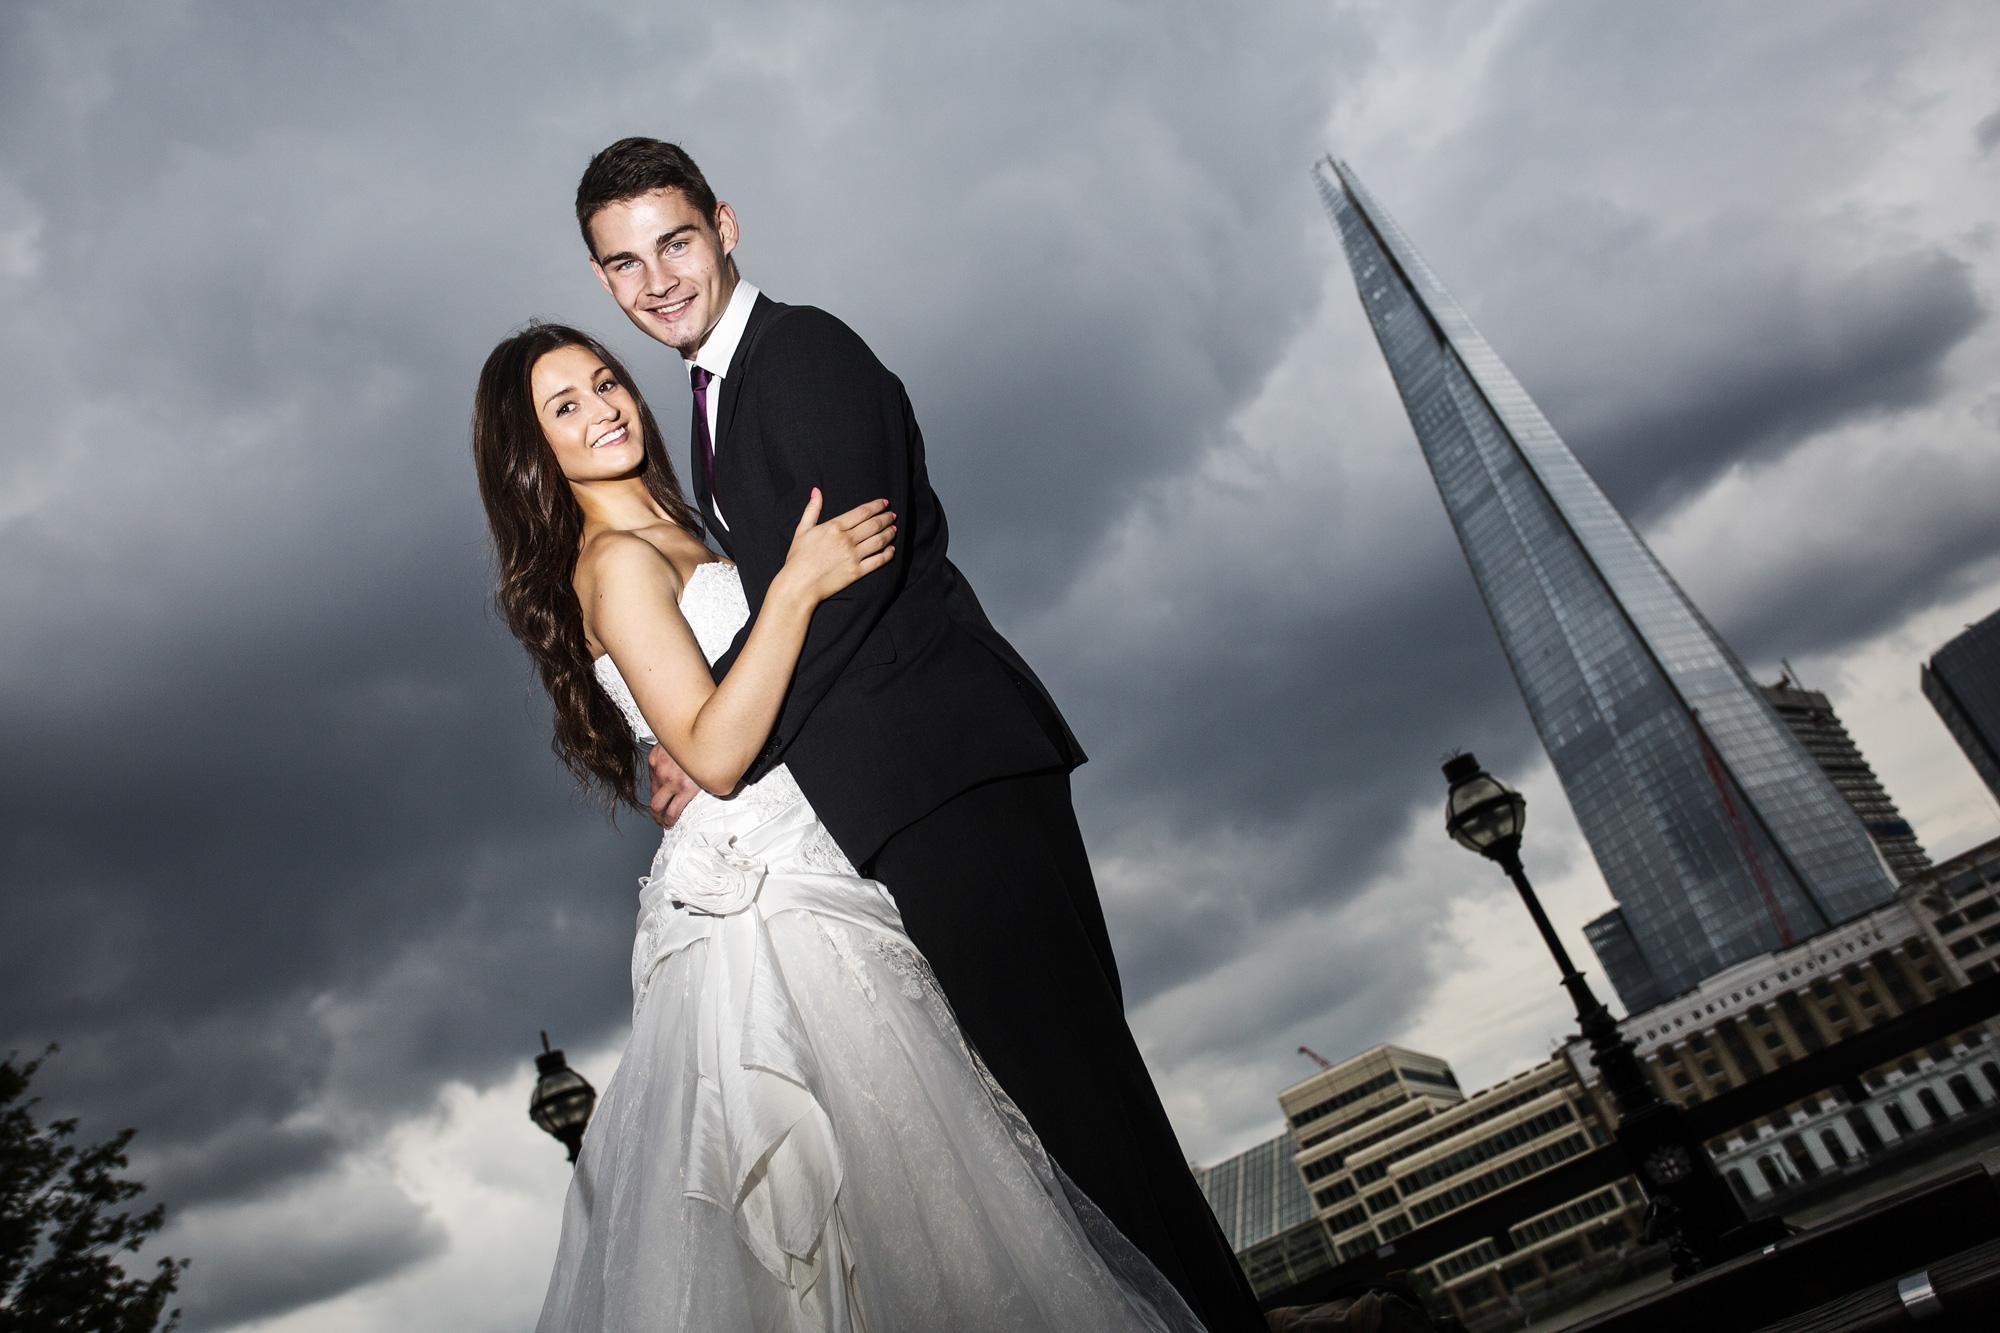 Adam_Hillier_Wedding_Photographer_Newbury_Berkshire_0 (9).jpg